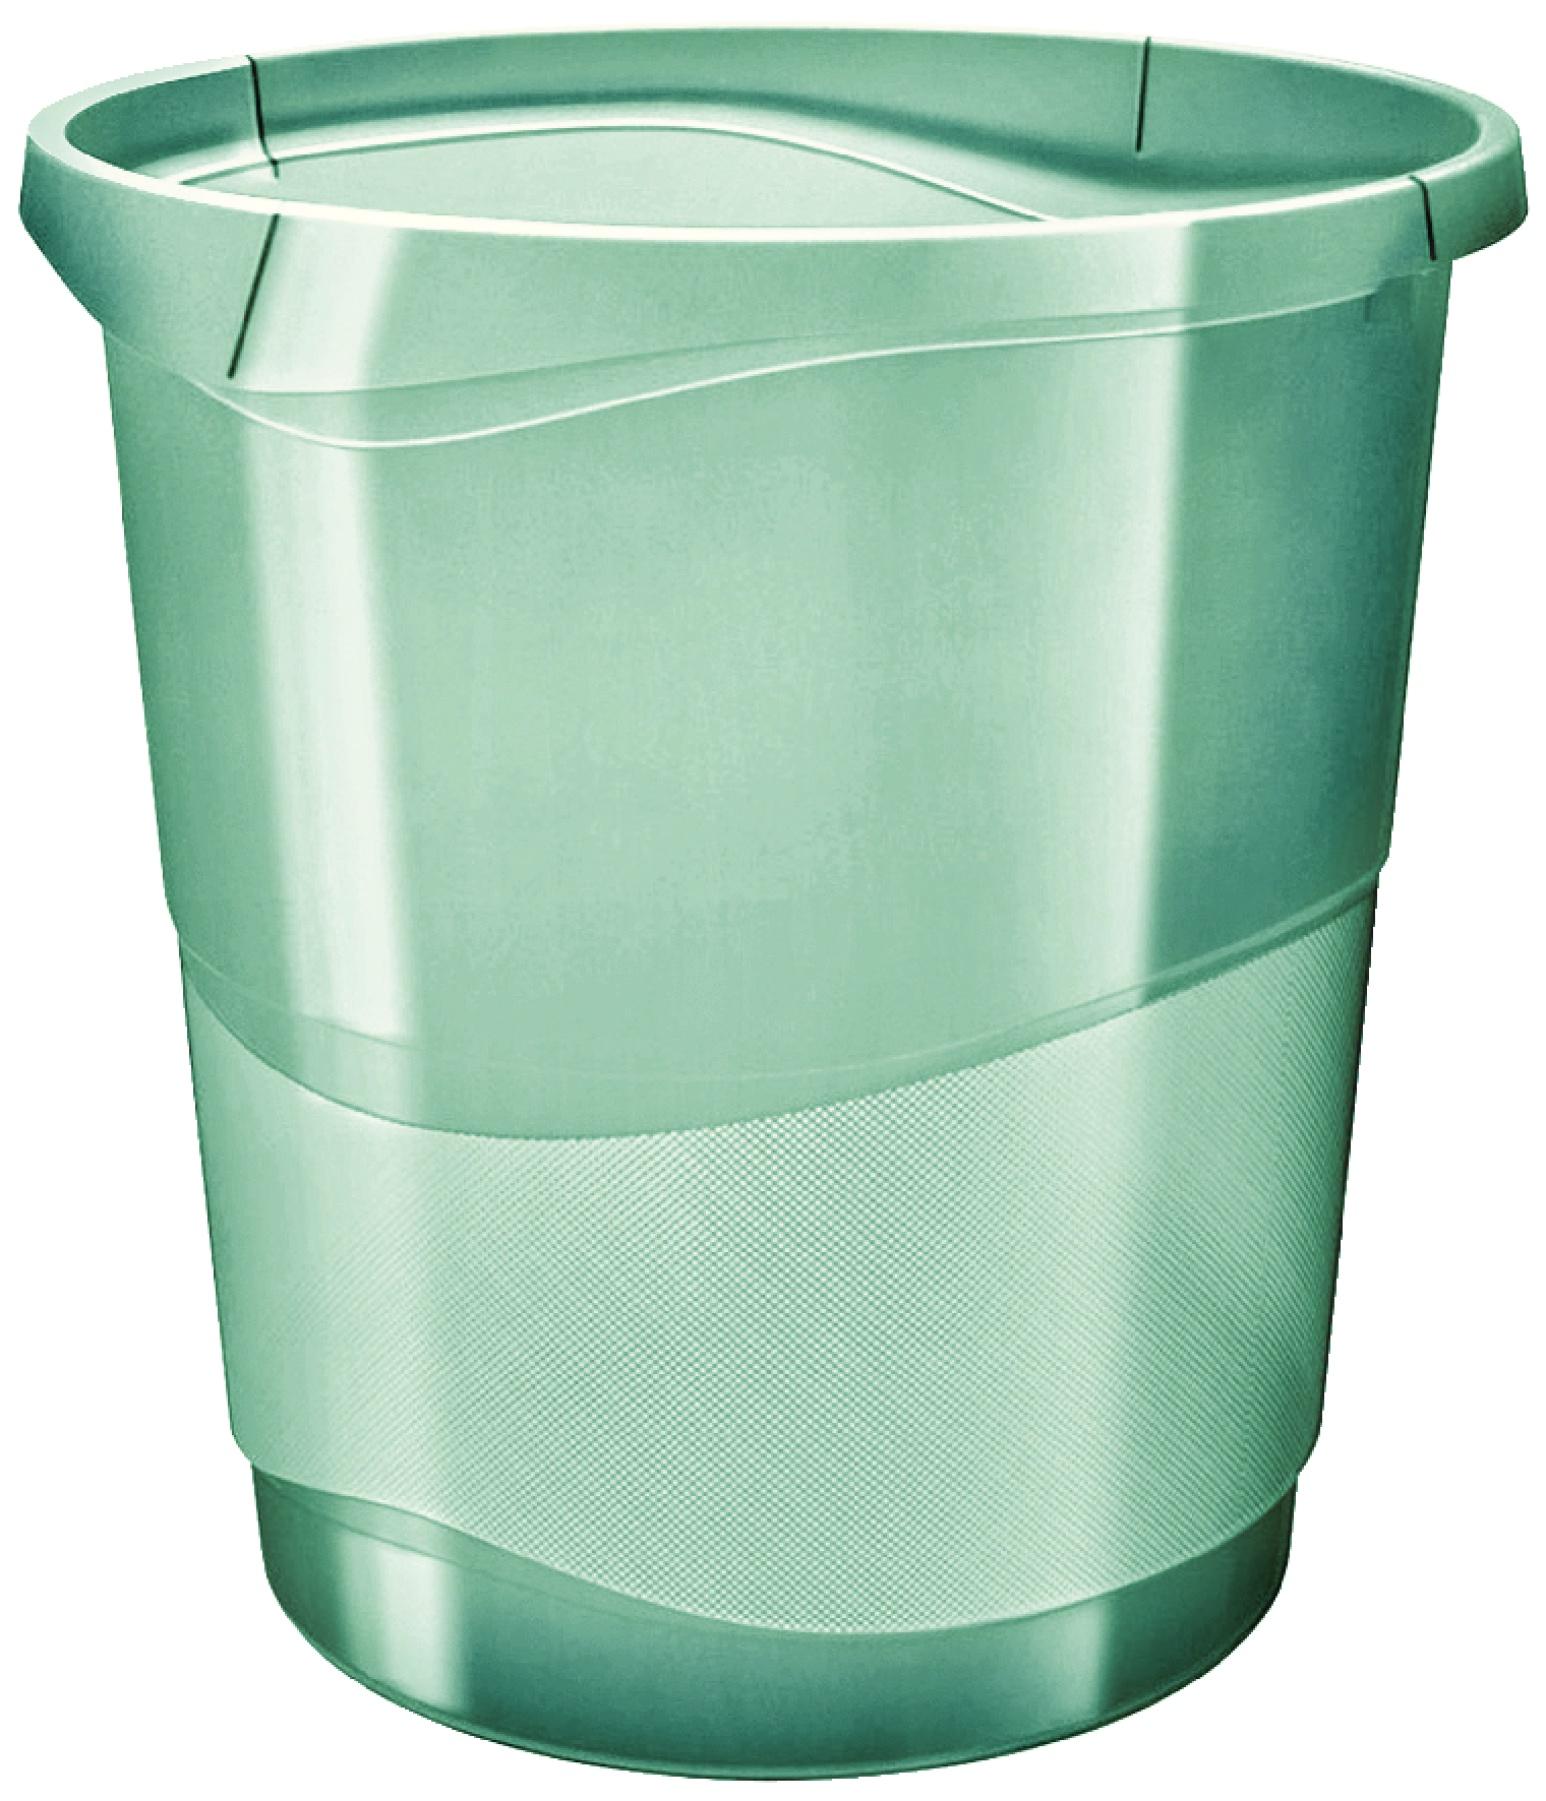 Корзина для мусора Esselte Colour'Ice, зеленый, 14 л